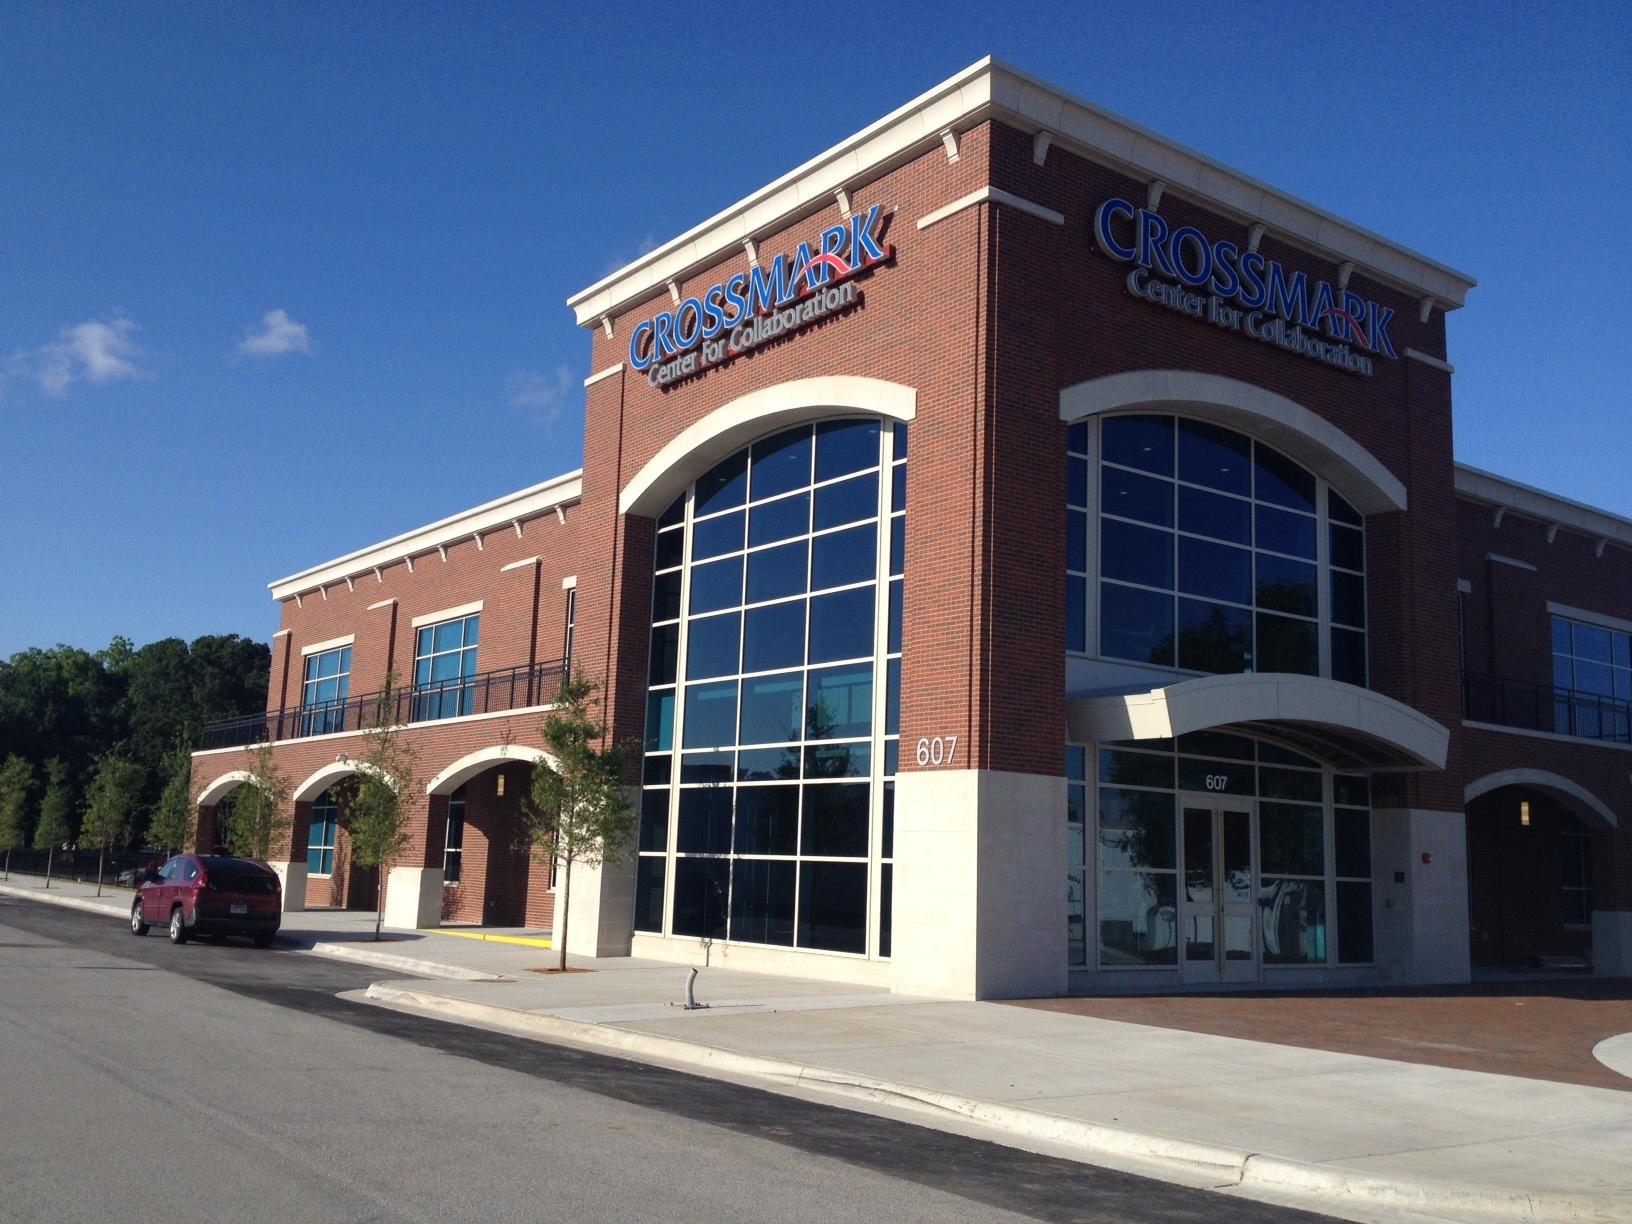 CROSSMARK Center for Collaboration Opens Next to Walmart ...